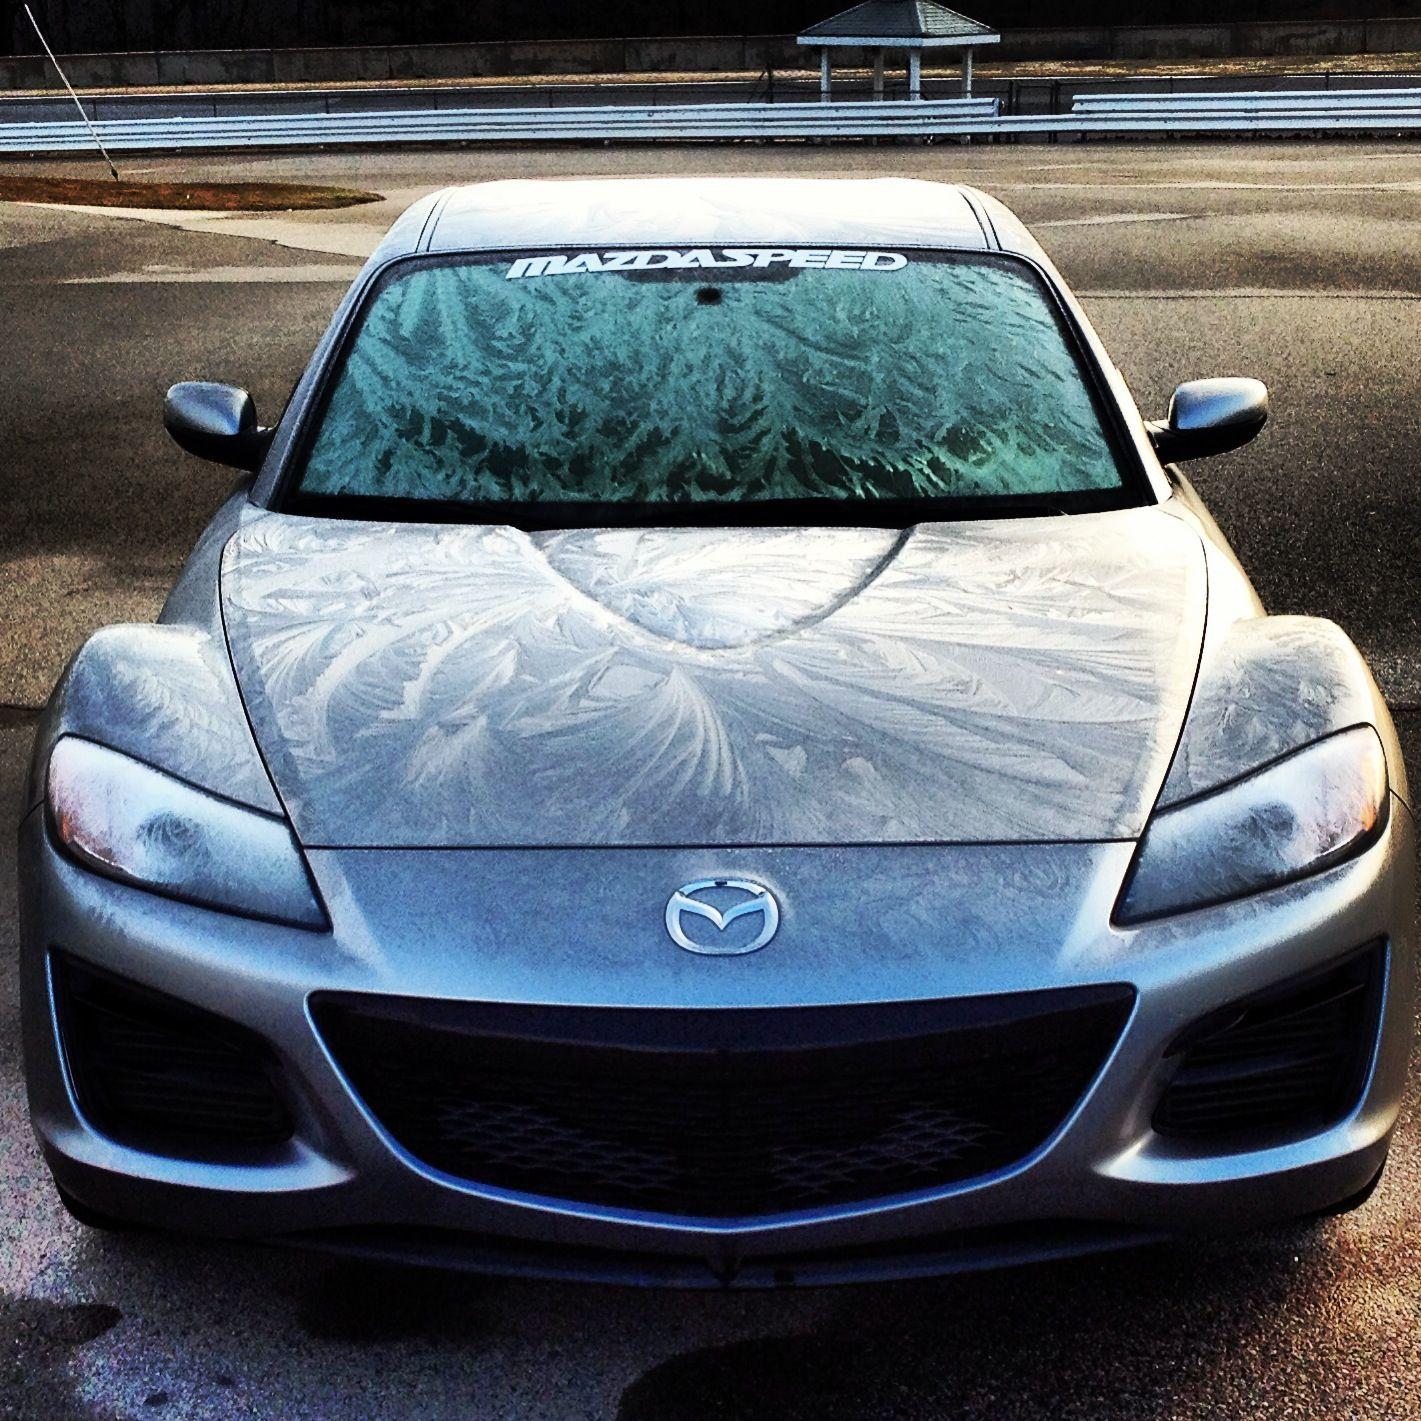 Automobile Mazda Tuner Cars: Creative Writing Board